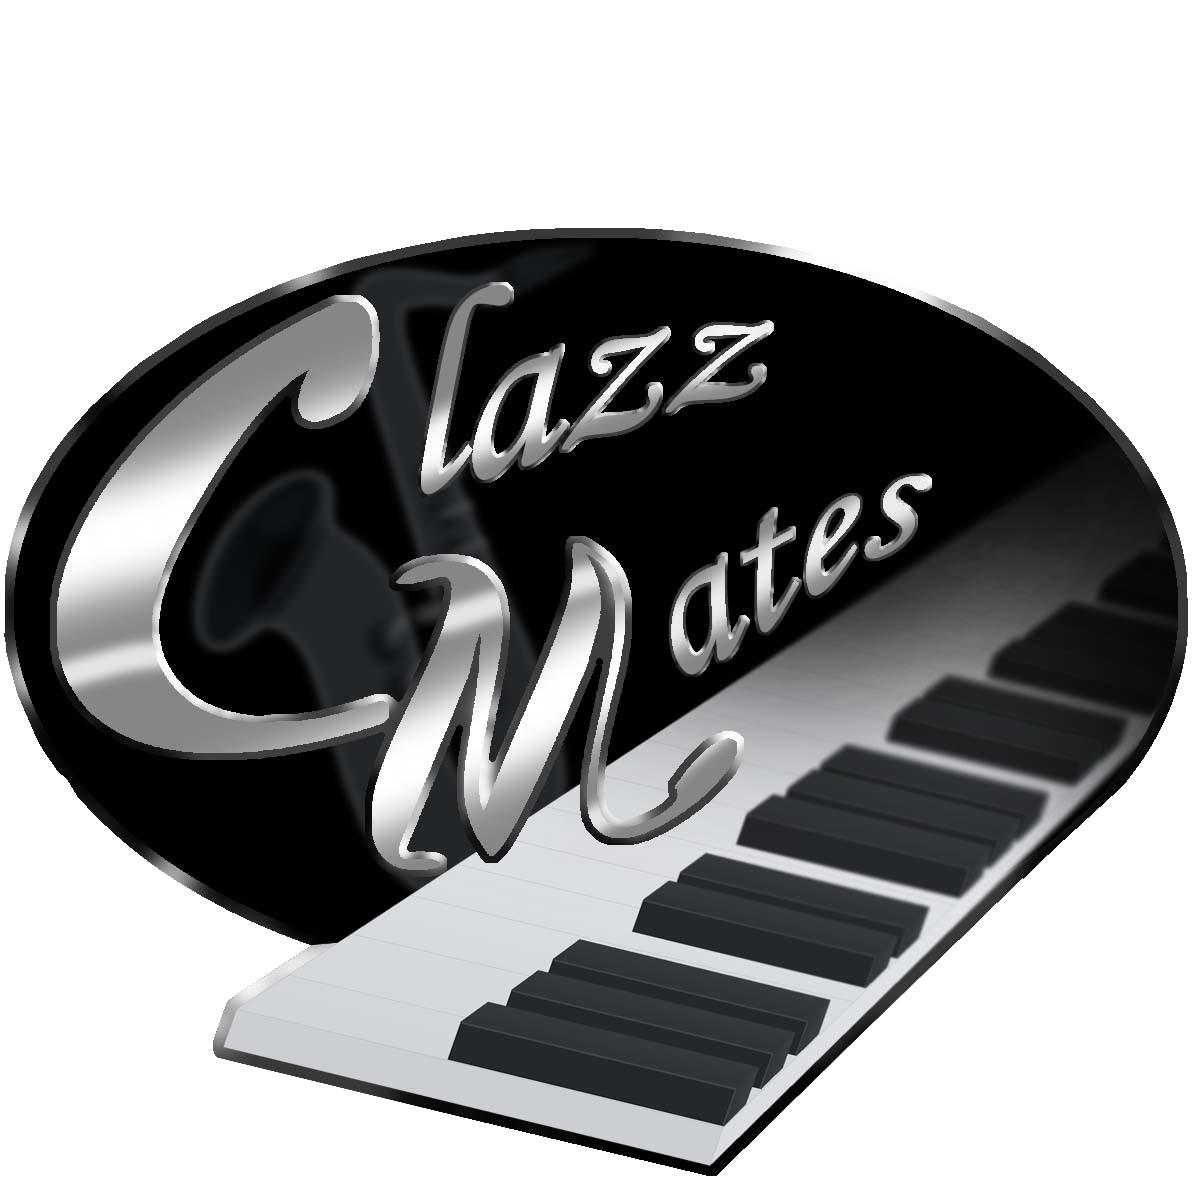 CLAZZMATES